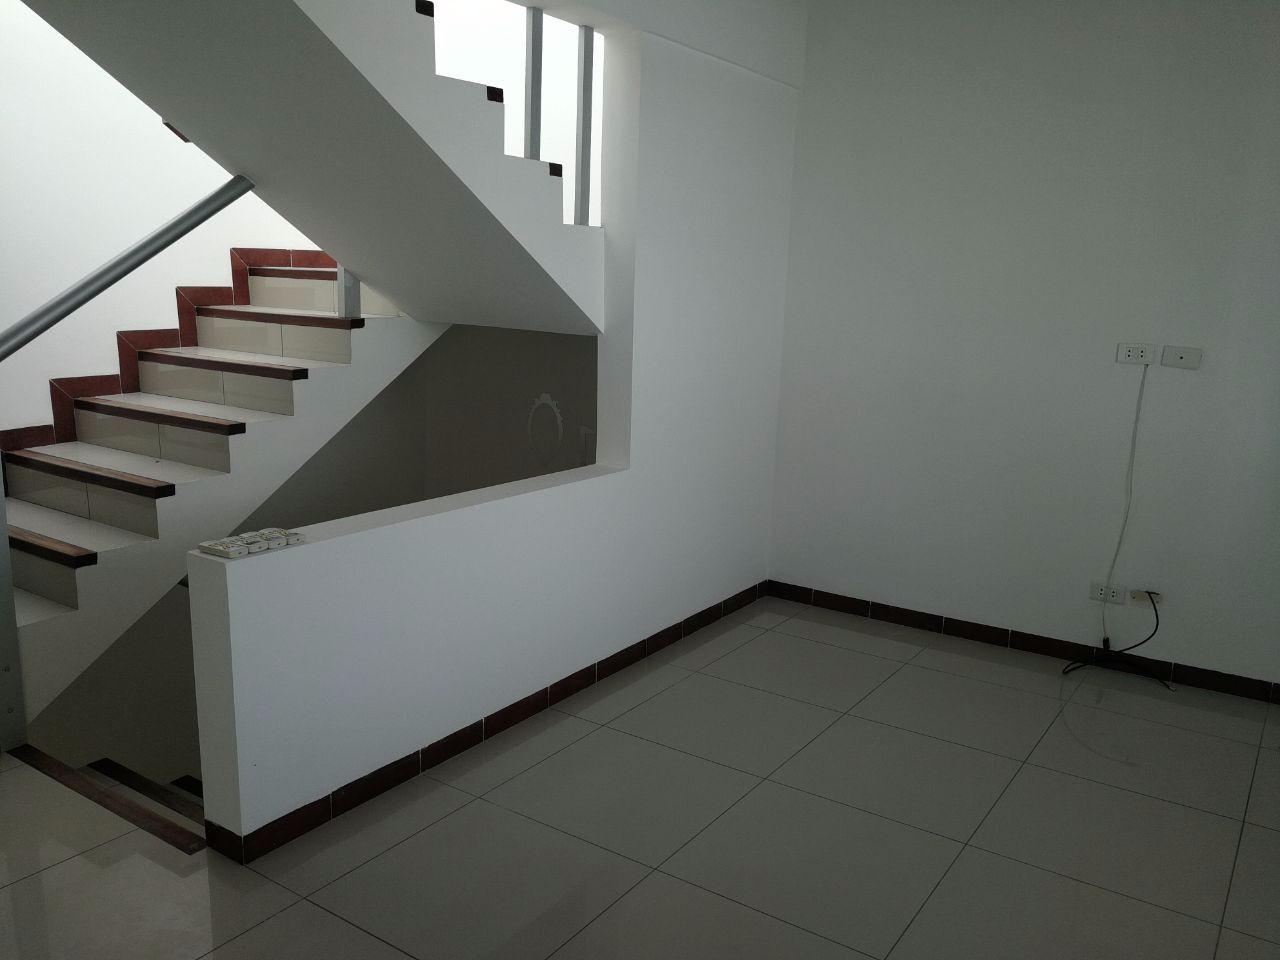 Casa en Alquiler Zona norte; 4to anillo entre av banzer y av. Beni Foto 3